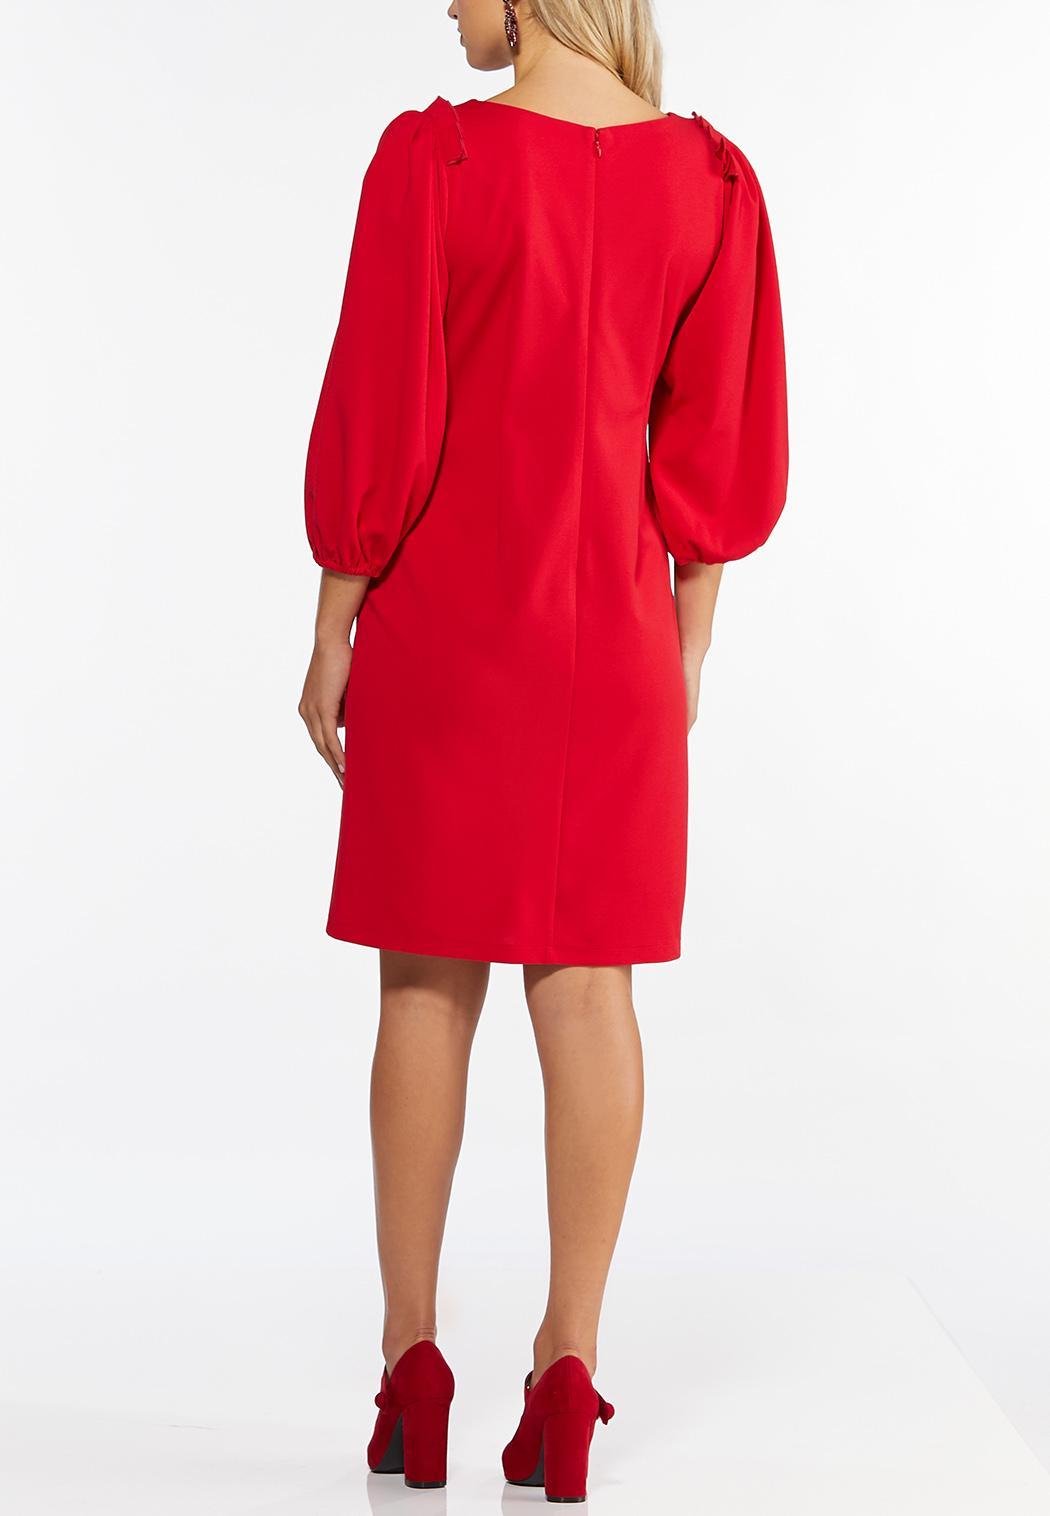 Red Pleated Sheath Dress (Item #44445005)